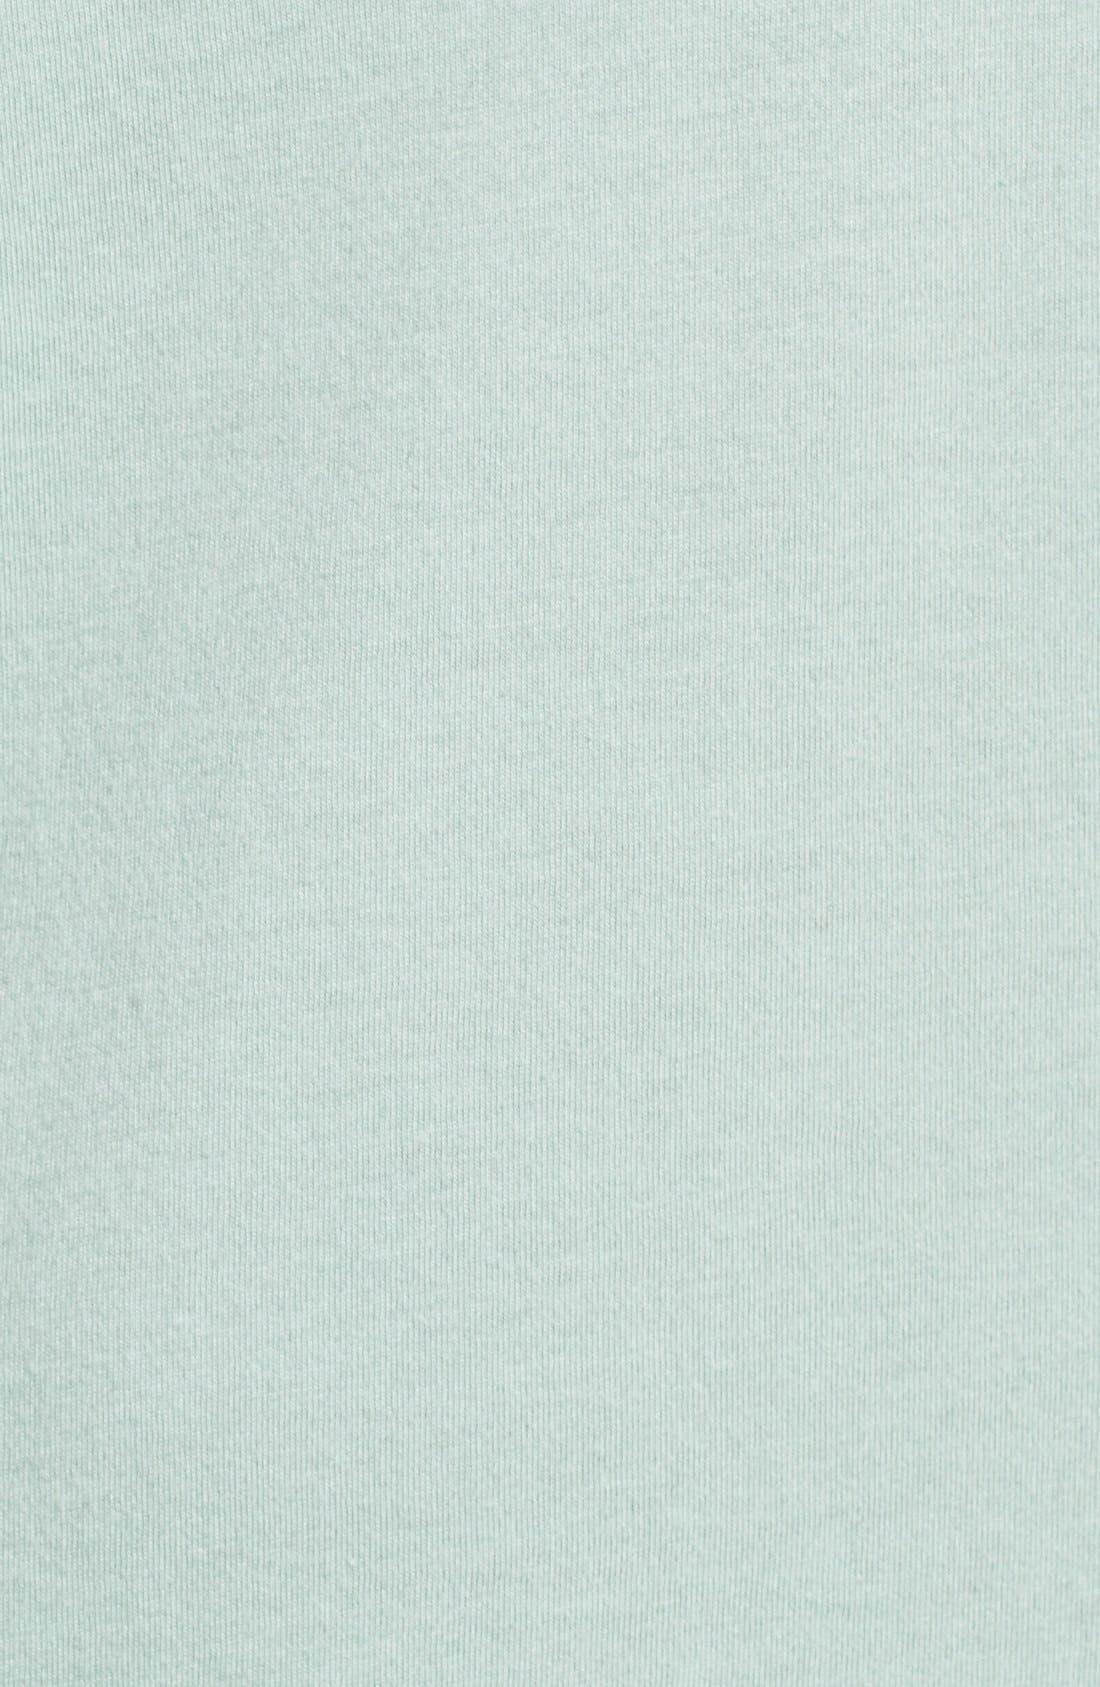 Short Sleeve Crewneck Tee,                             Alternate thumbnail 56, color,